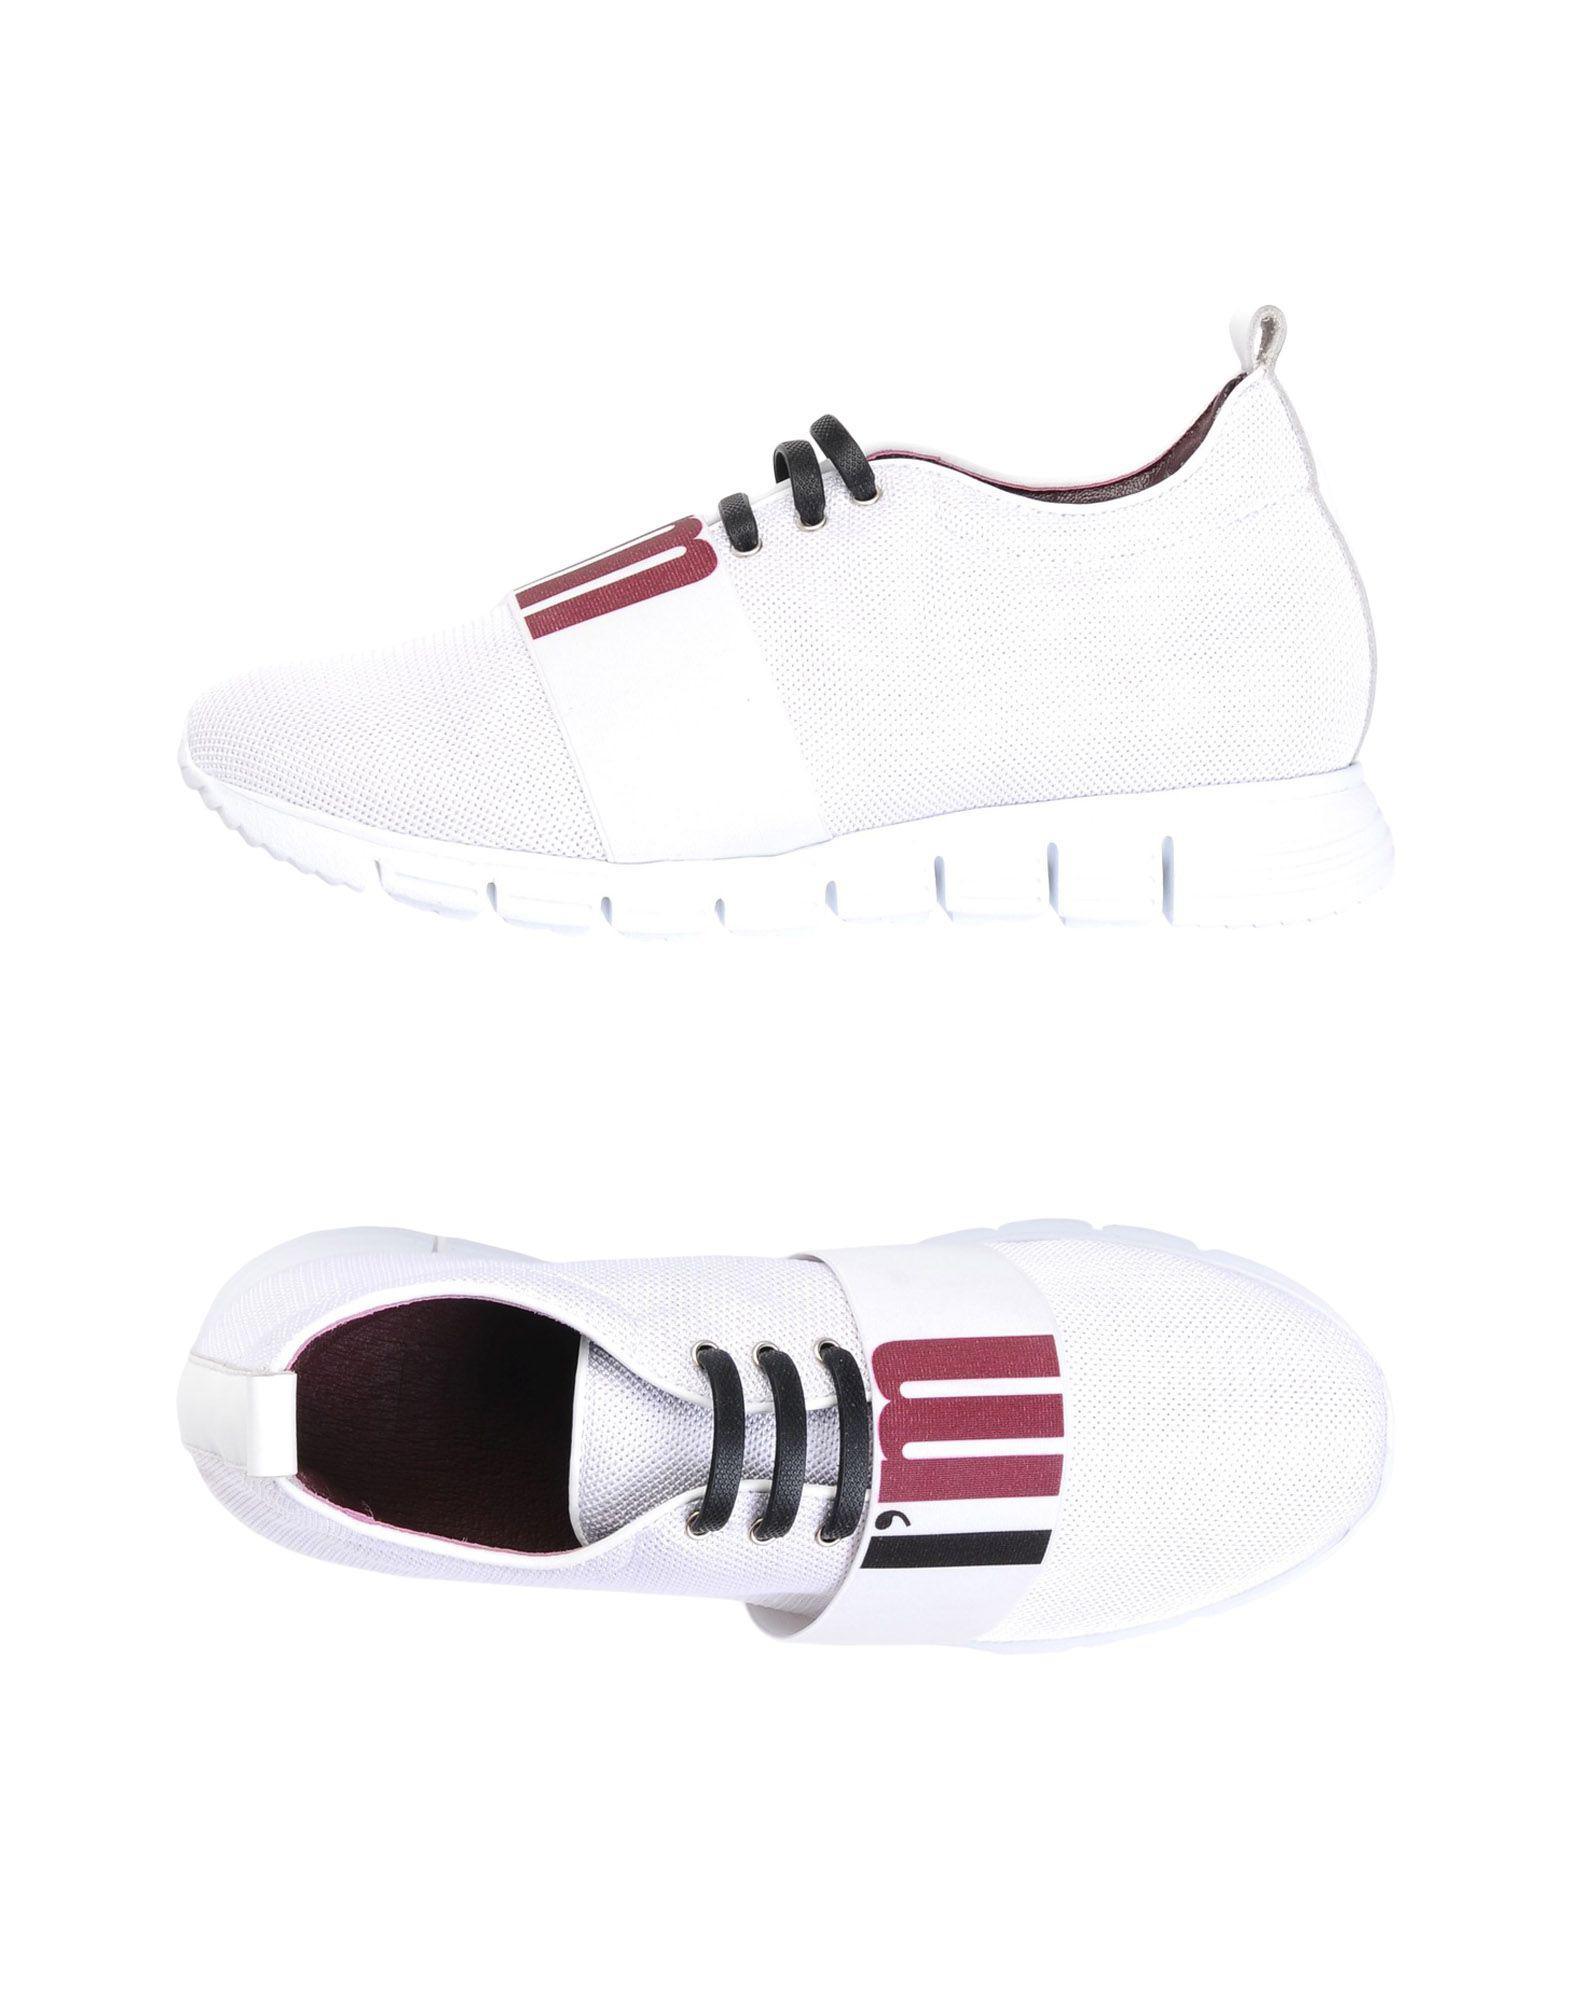 FOOTWEAR - High-tops & sneakers I'm Isola Marras BFJmlNWrAp